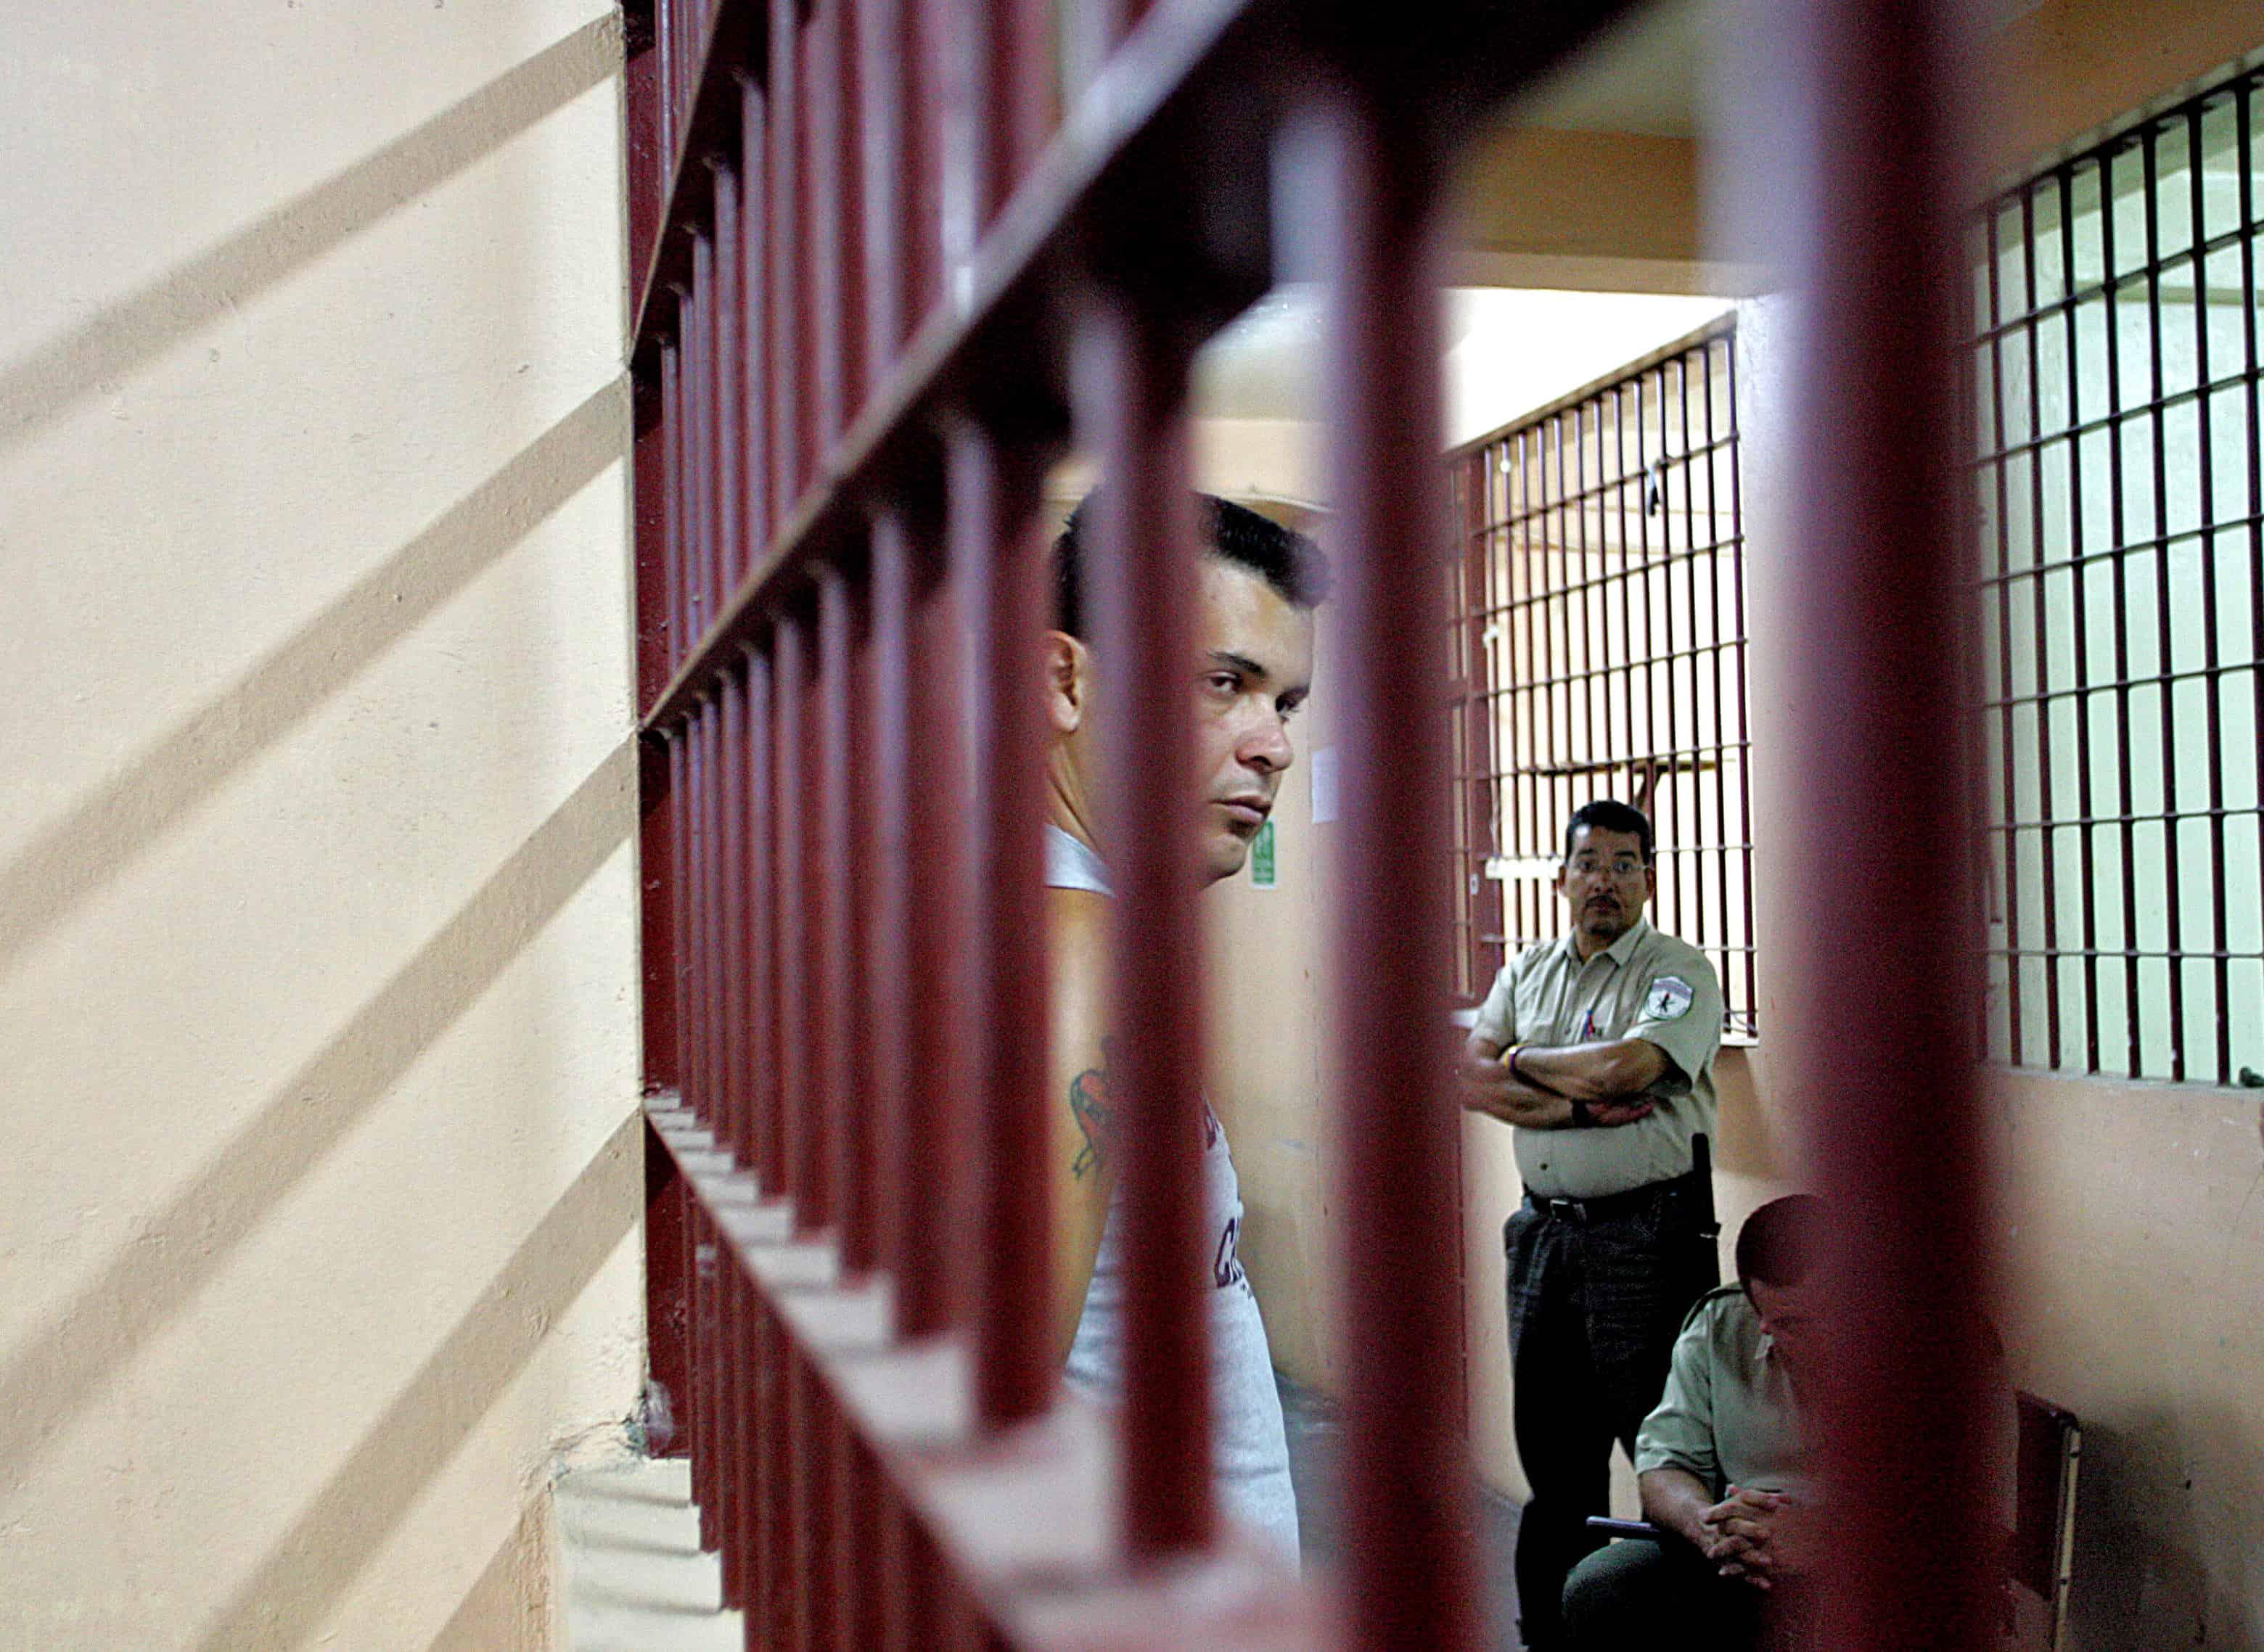 An inmate at San Sebastián.